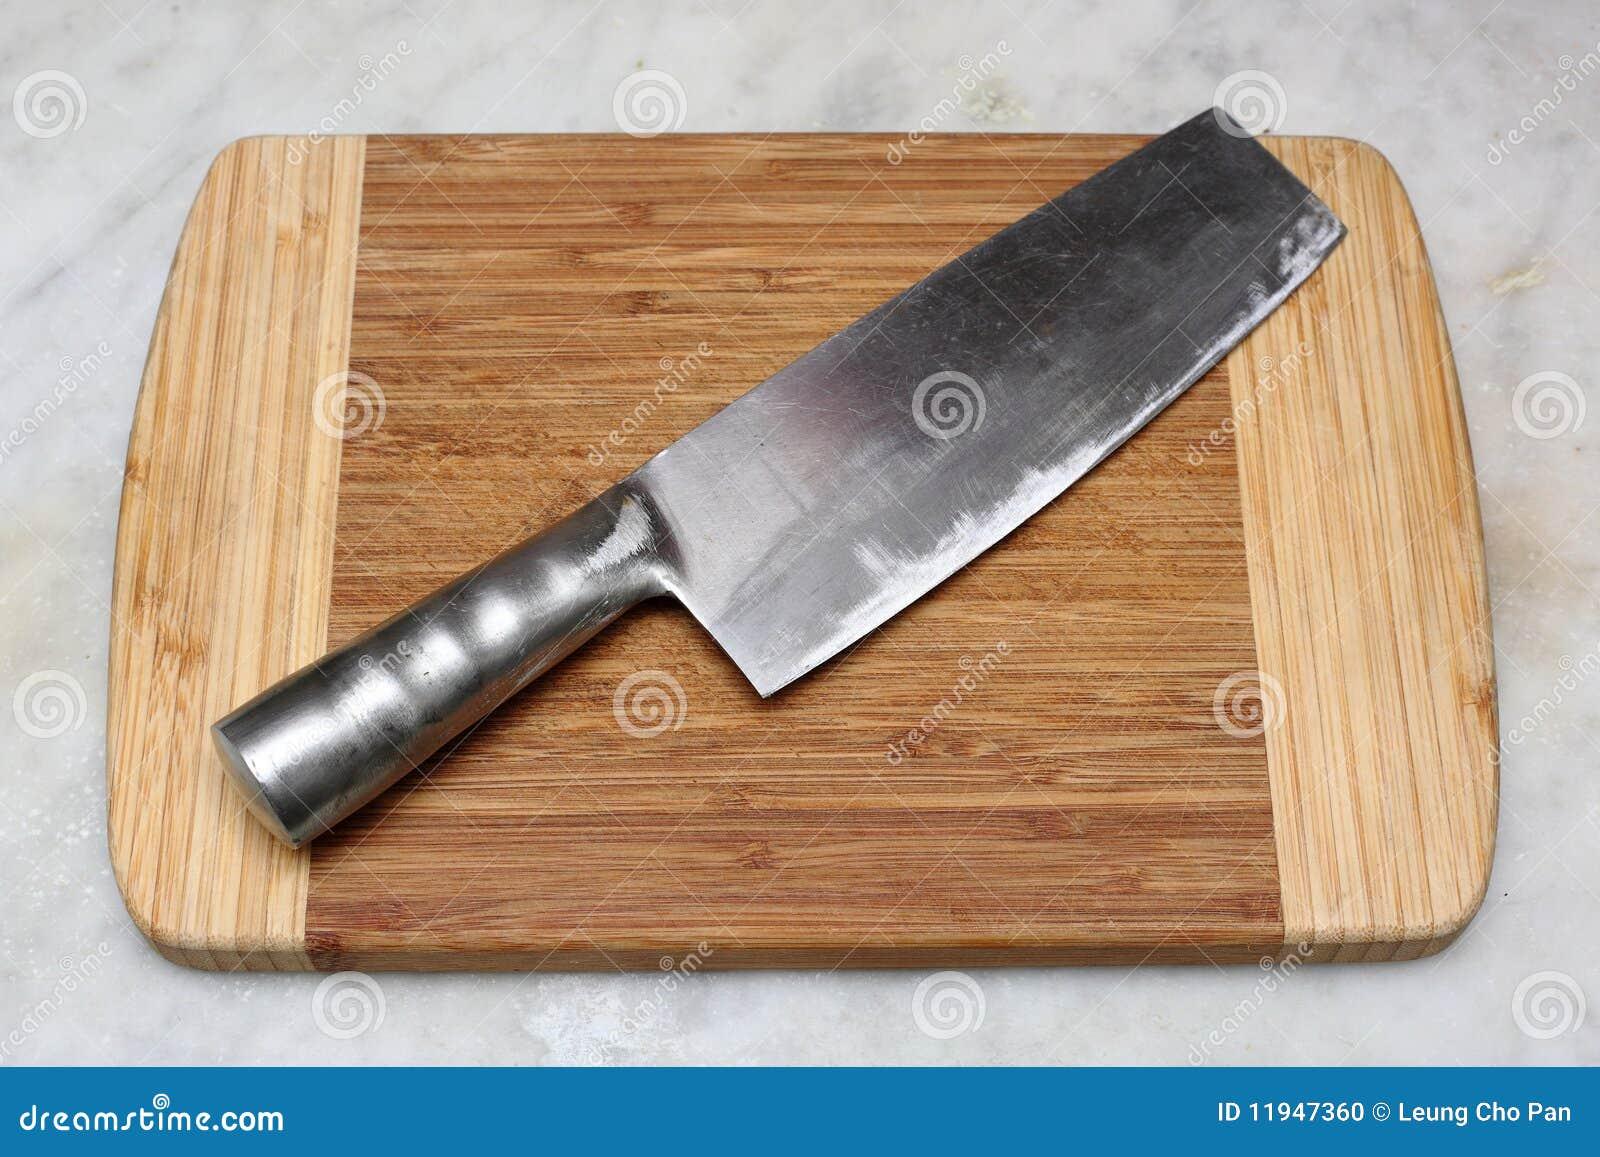 Chinese Kitchen Knife Stock Photo Image Of Utensil